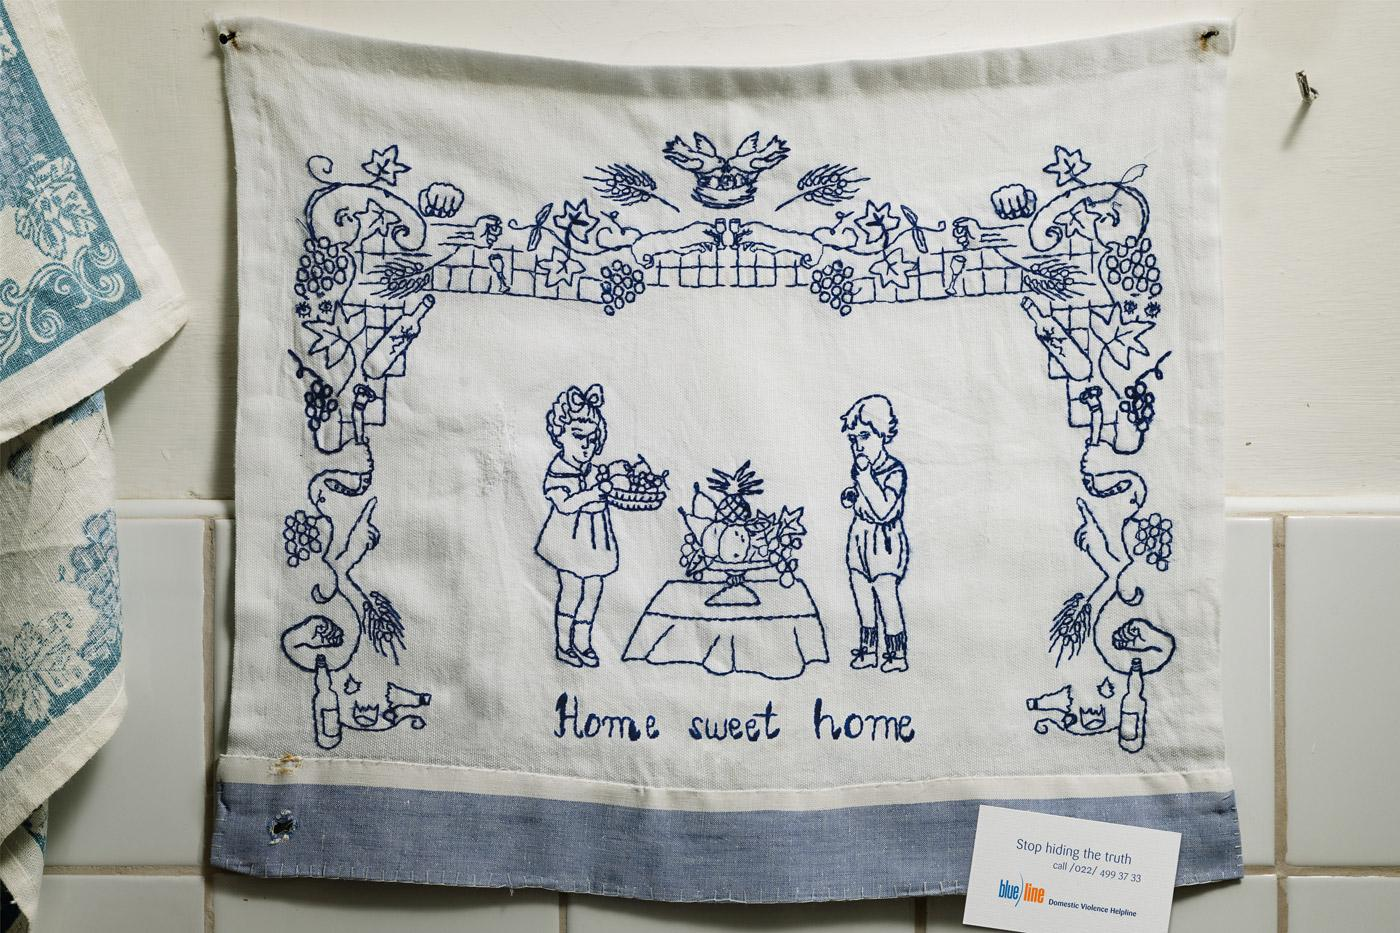 Blue line Print Ad -  Home sweet home, 2